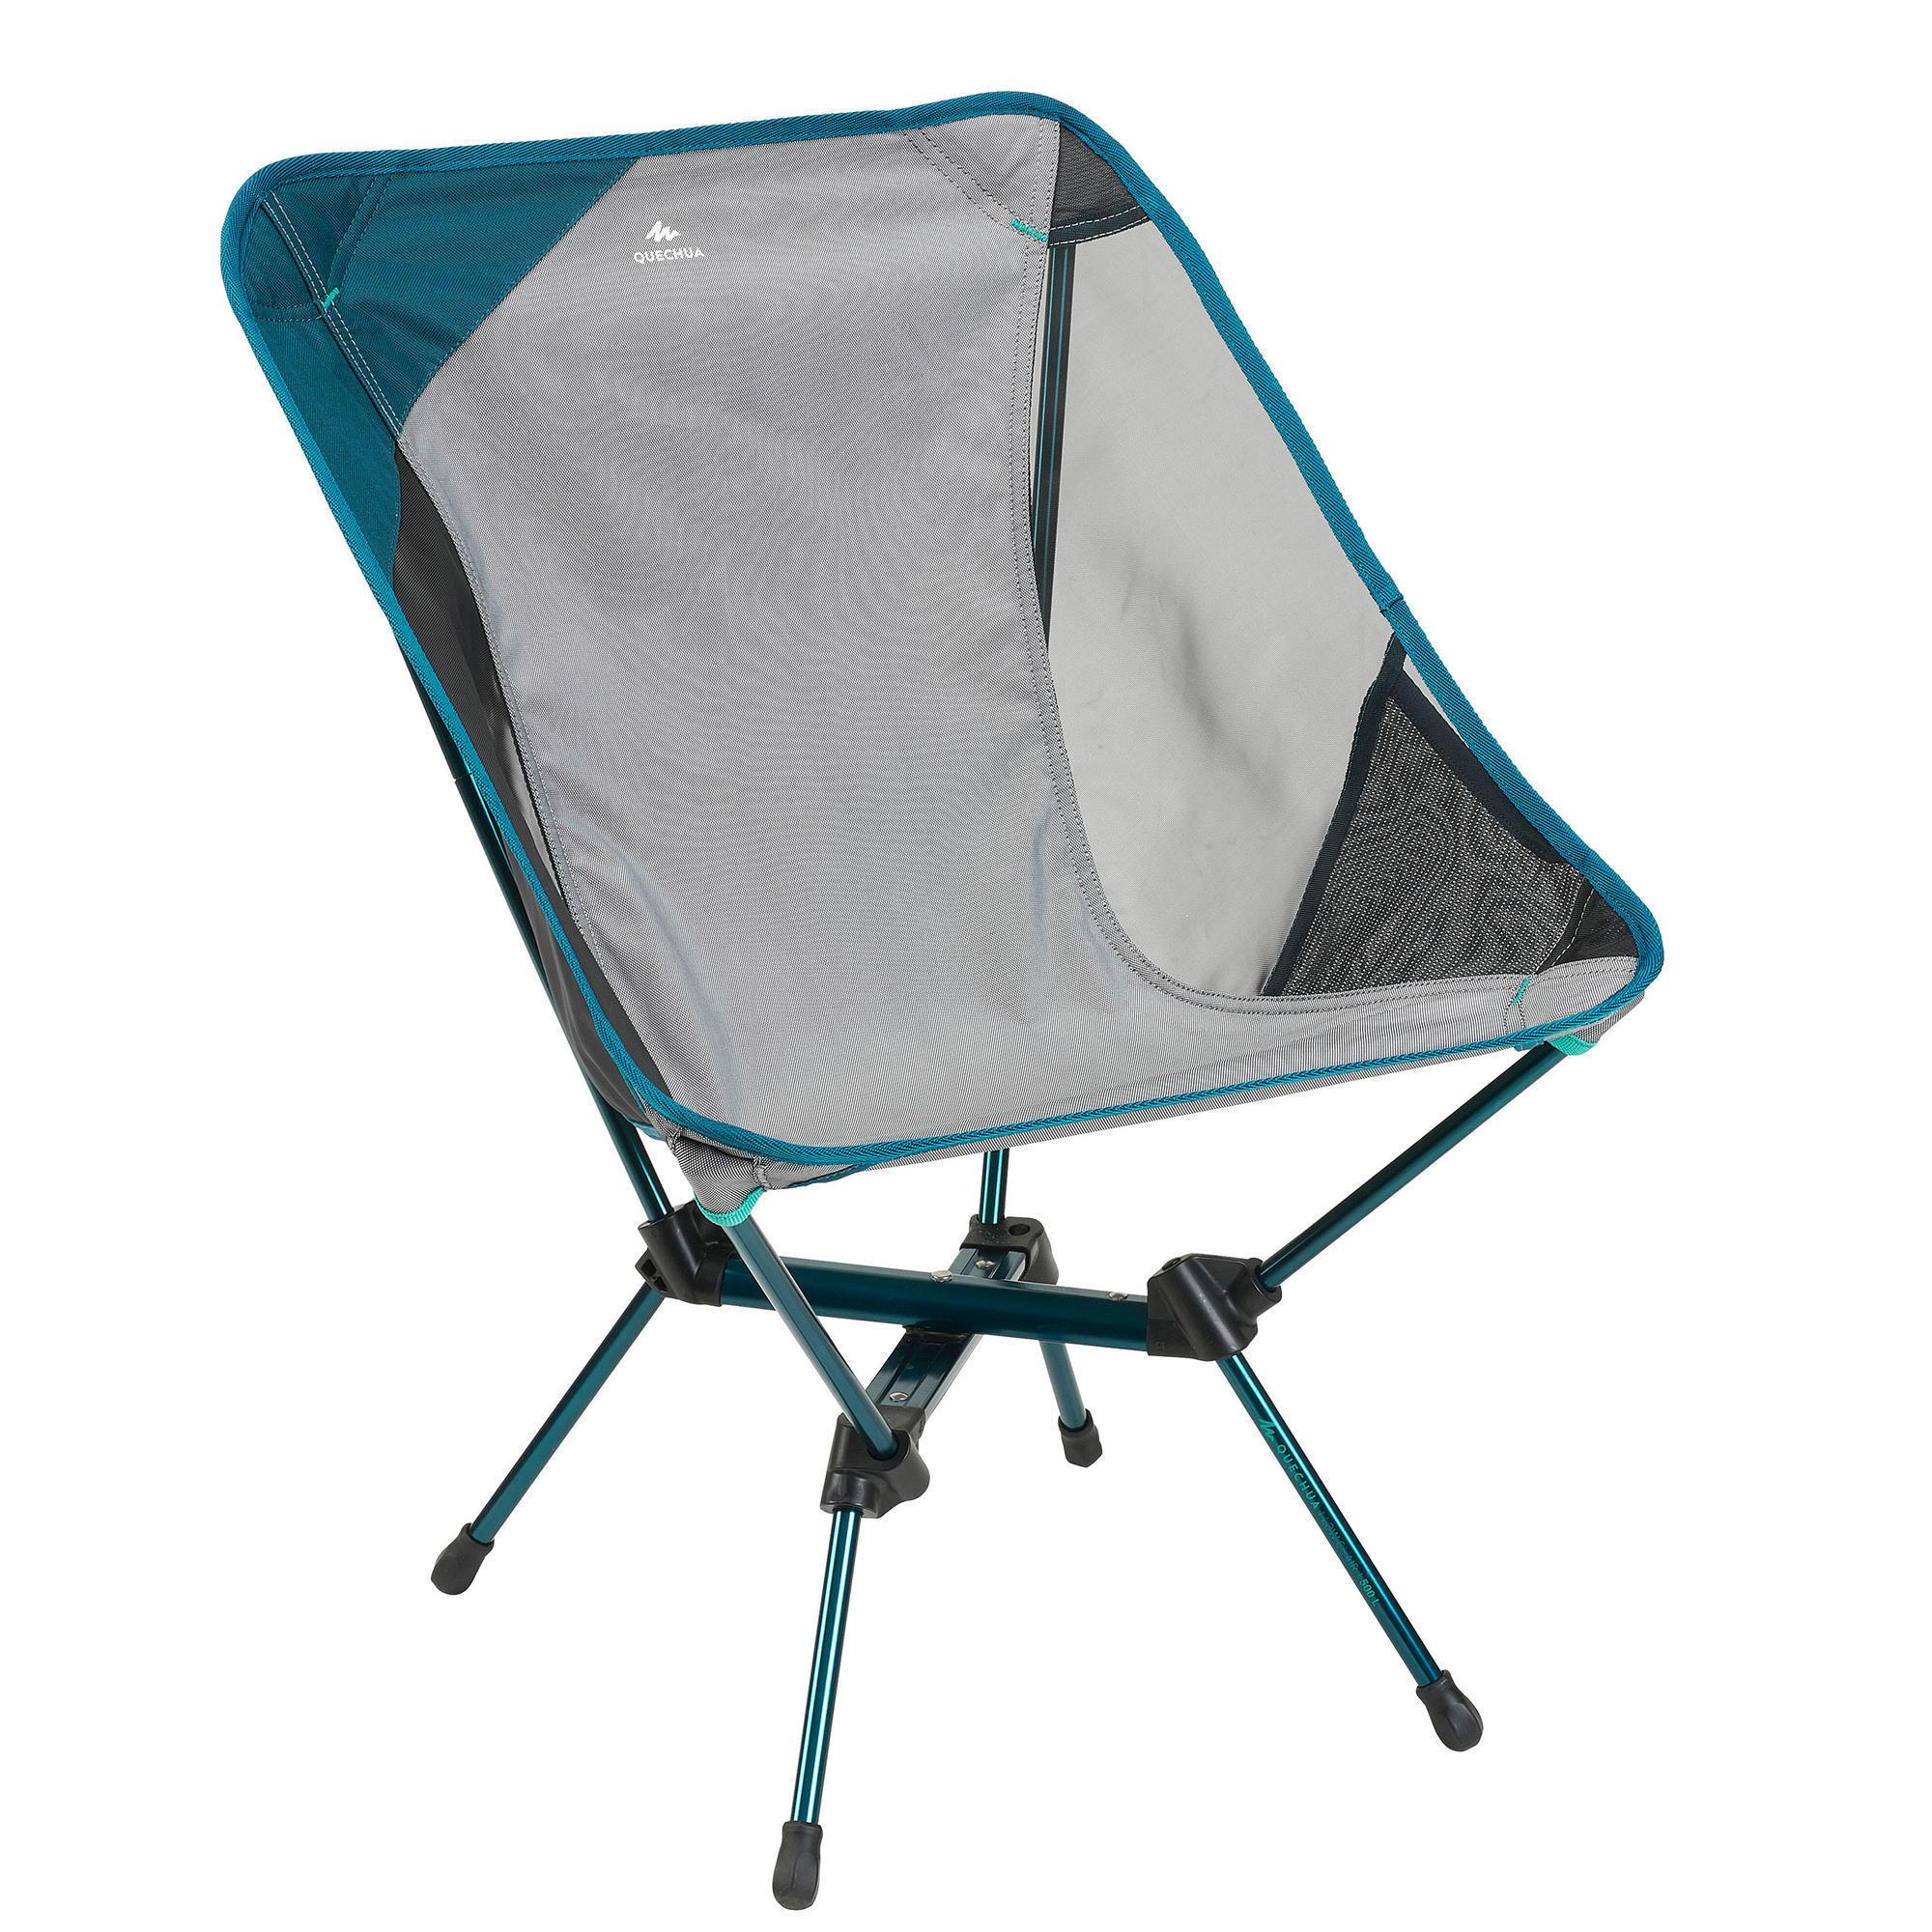 Redcliffs Lit De Camping Lit de camp pliant long XXL sac de transport vert